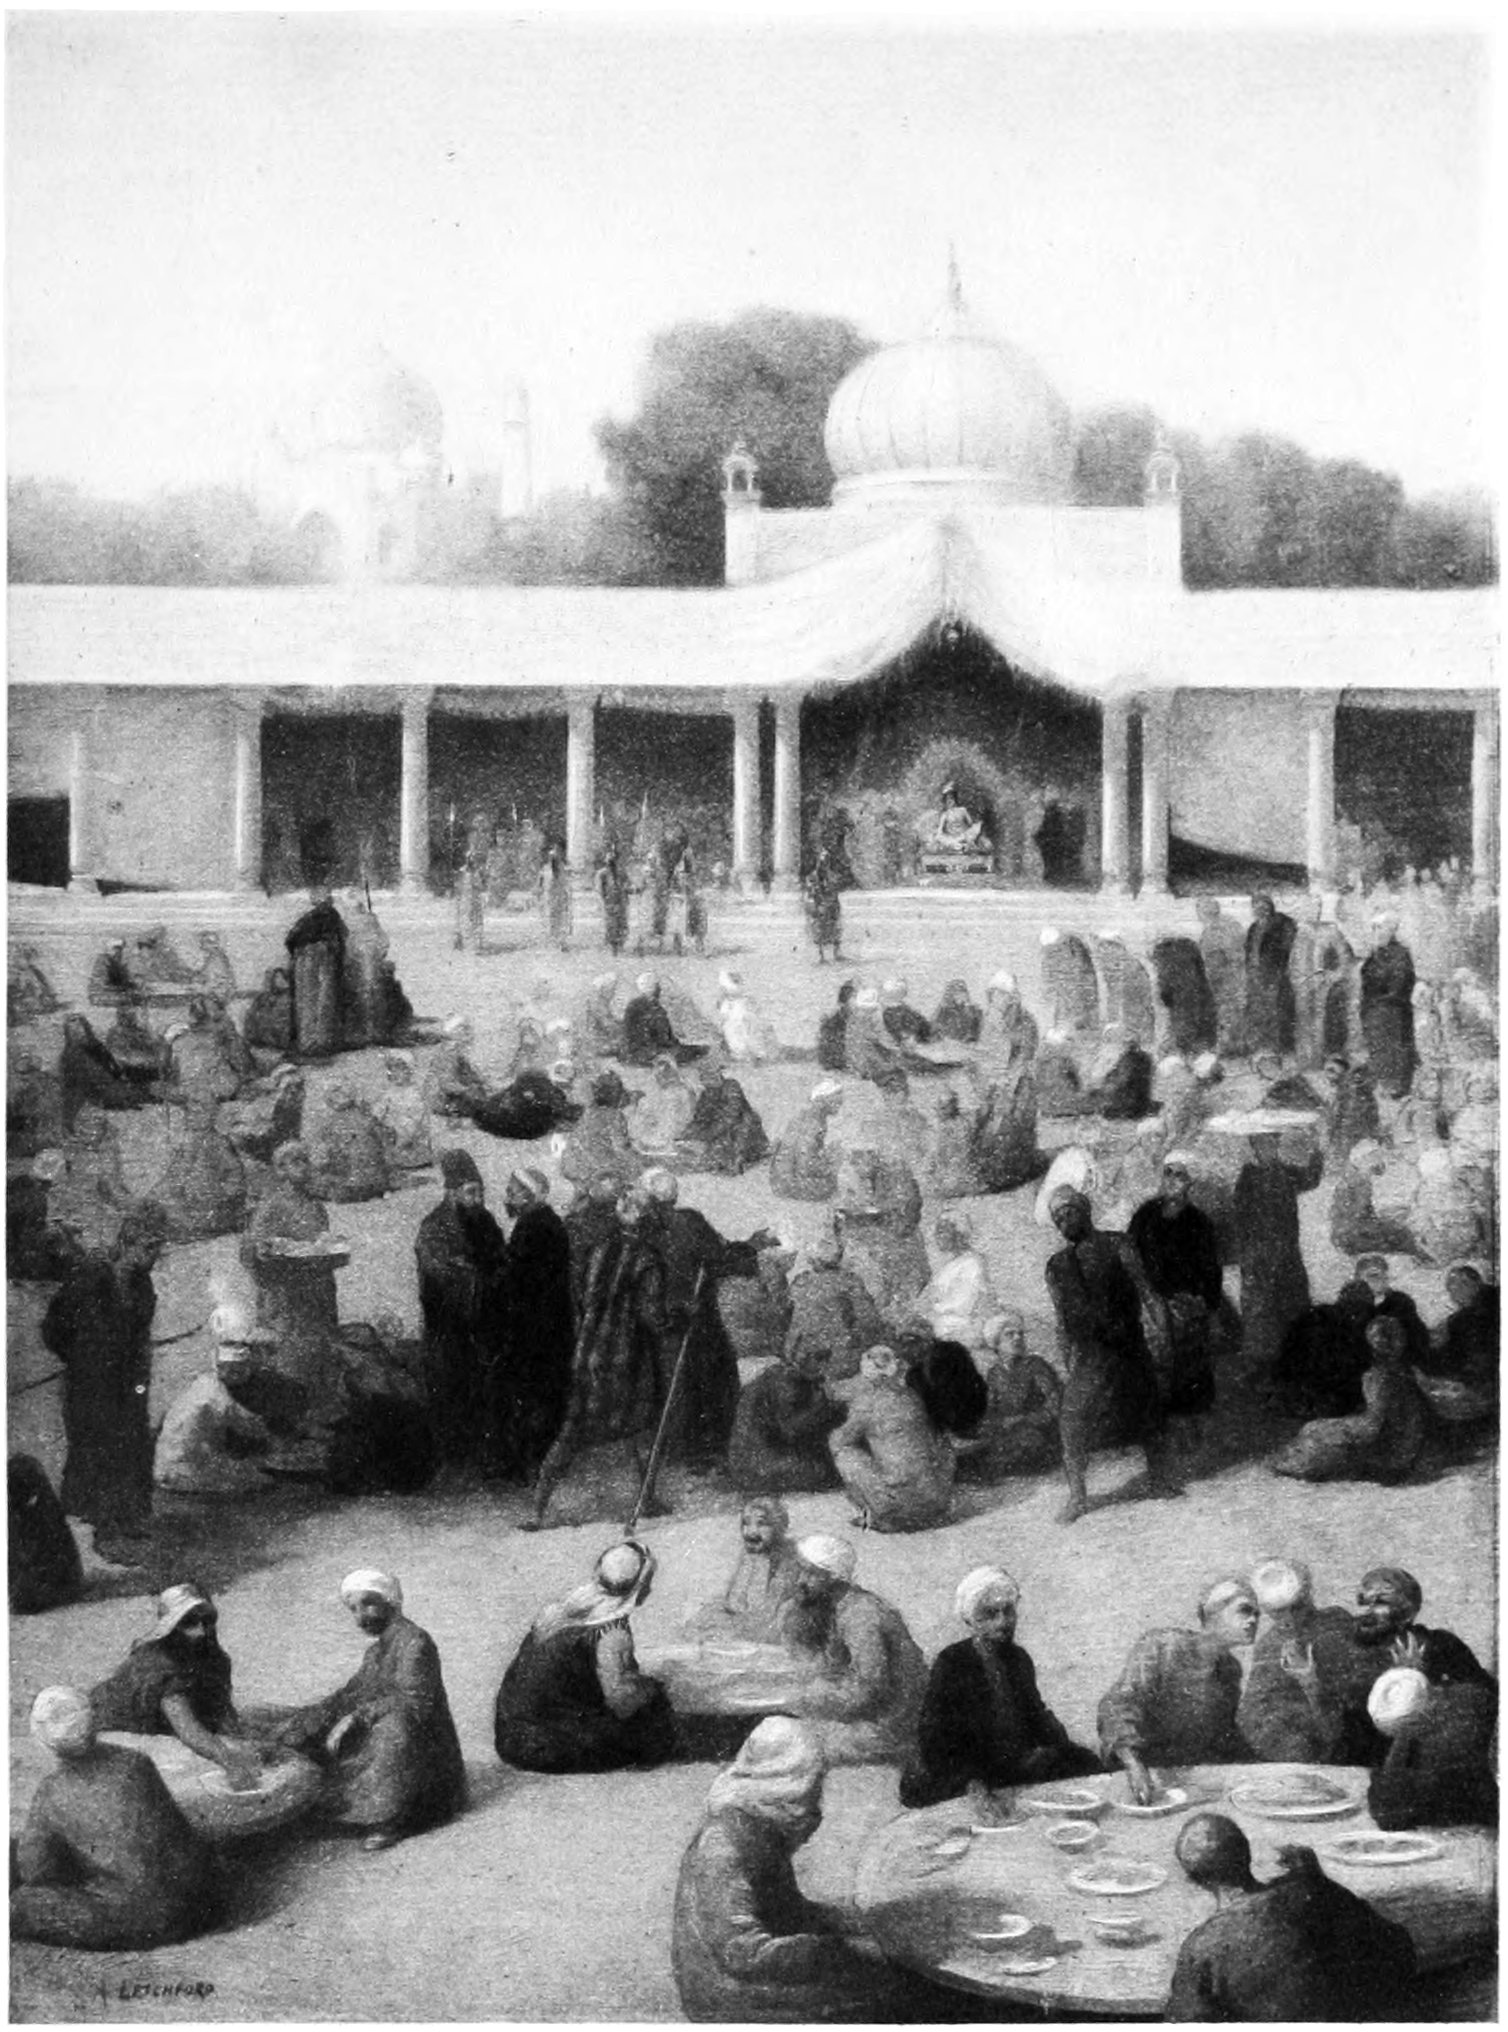 Ali Shar and Zumurrud - Illustration by Albert Letchford